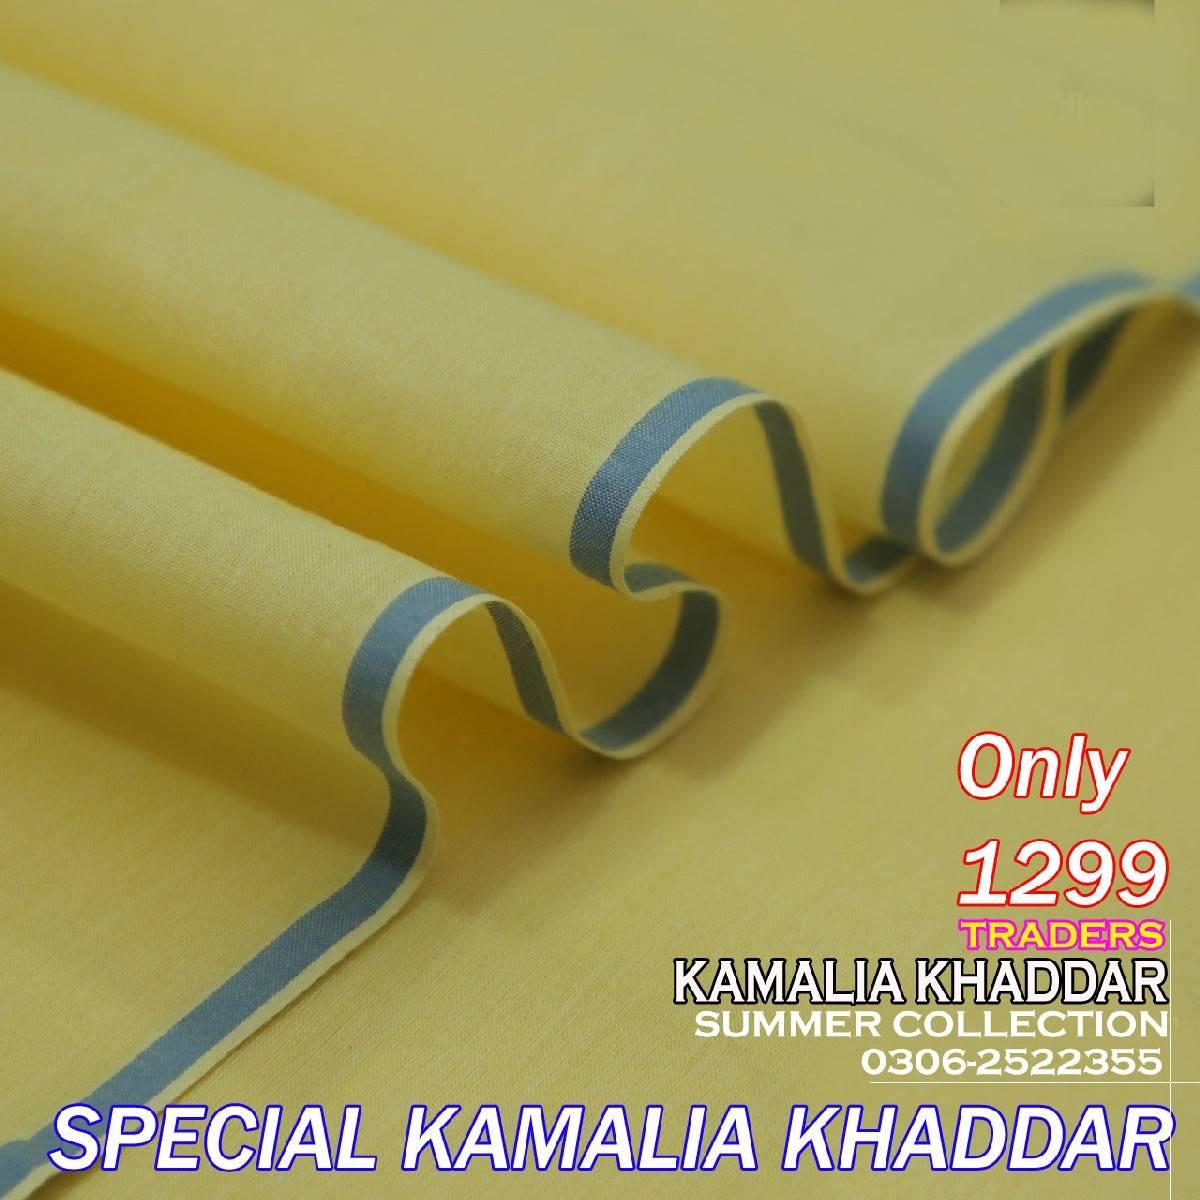 Summer Collection Kamalia Khaddar Unstitched Goli Khaddar Suit for Men - Premium Quality